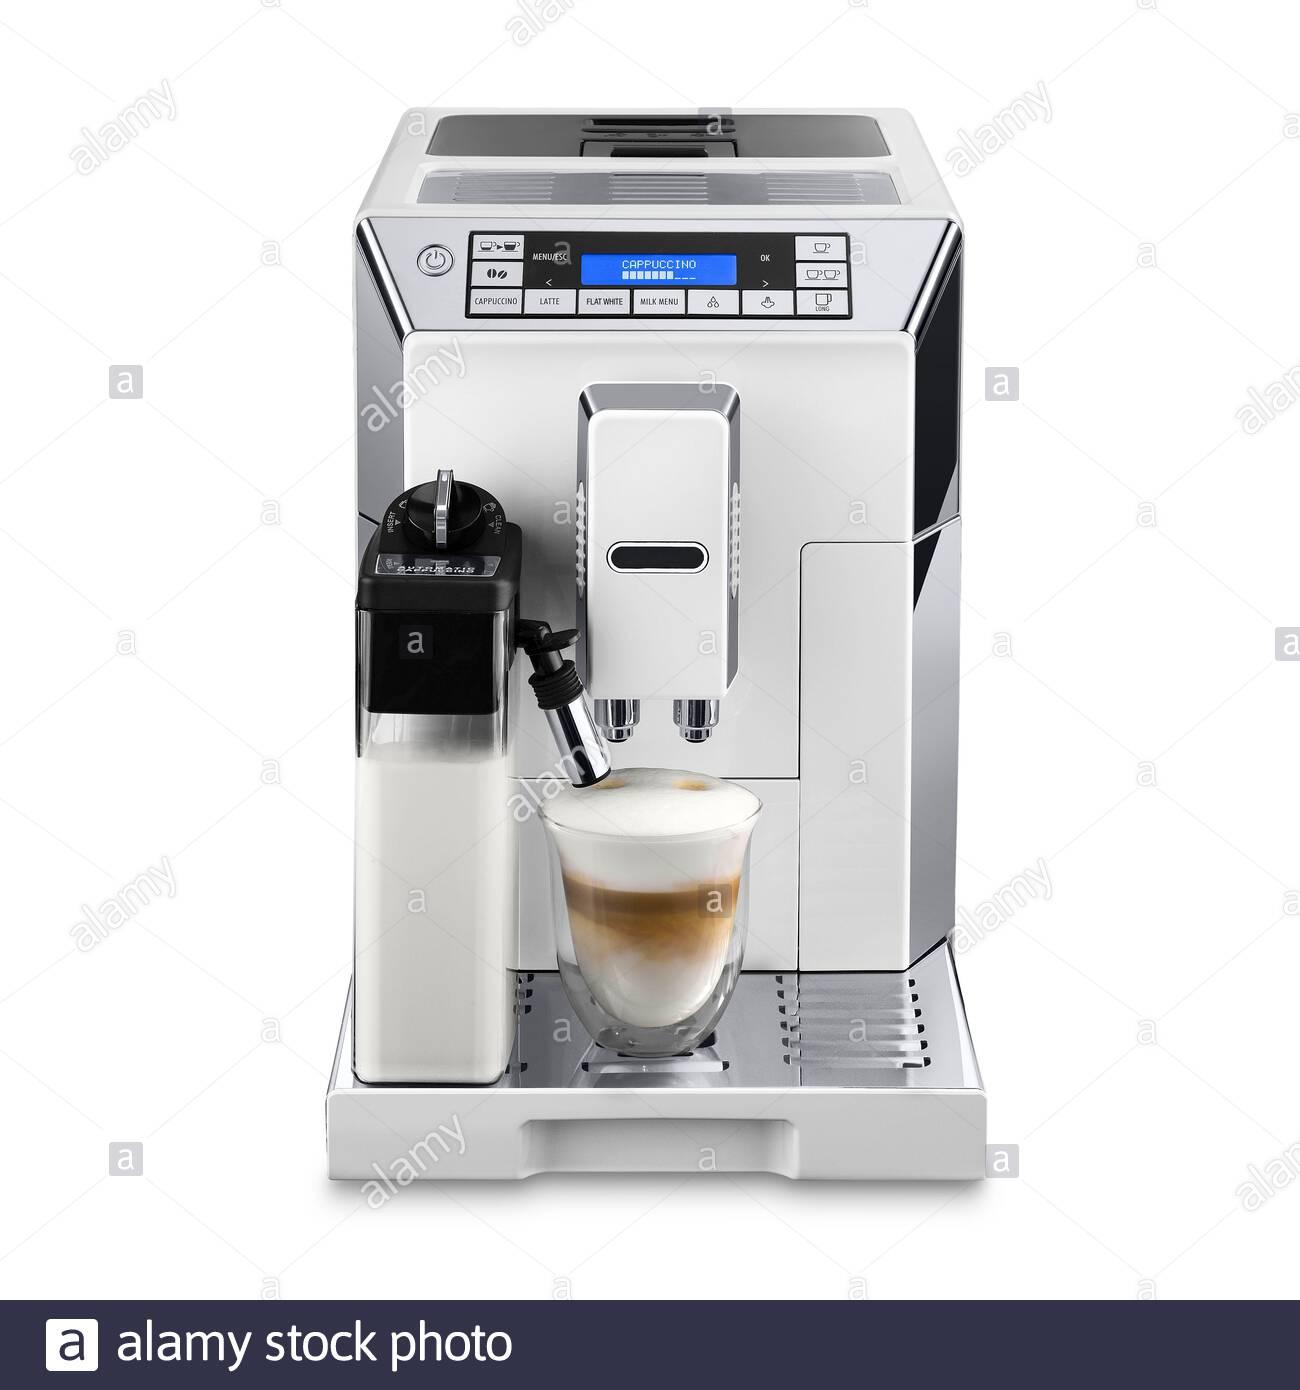 Automatic Coffee Maker Fotos e Imágenes de stock Alamy